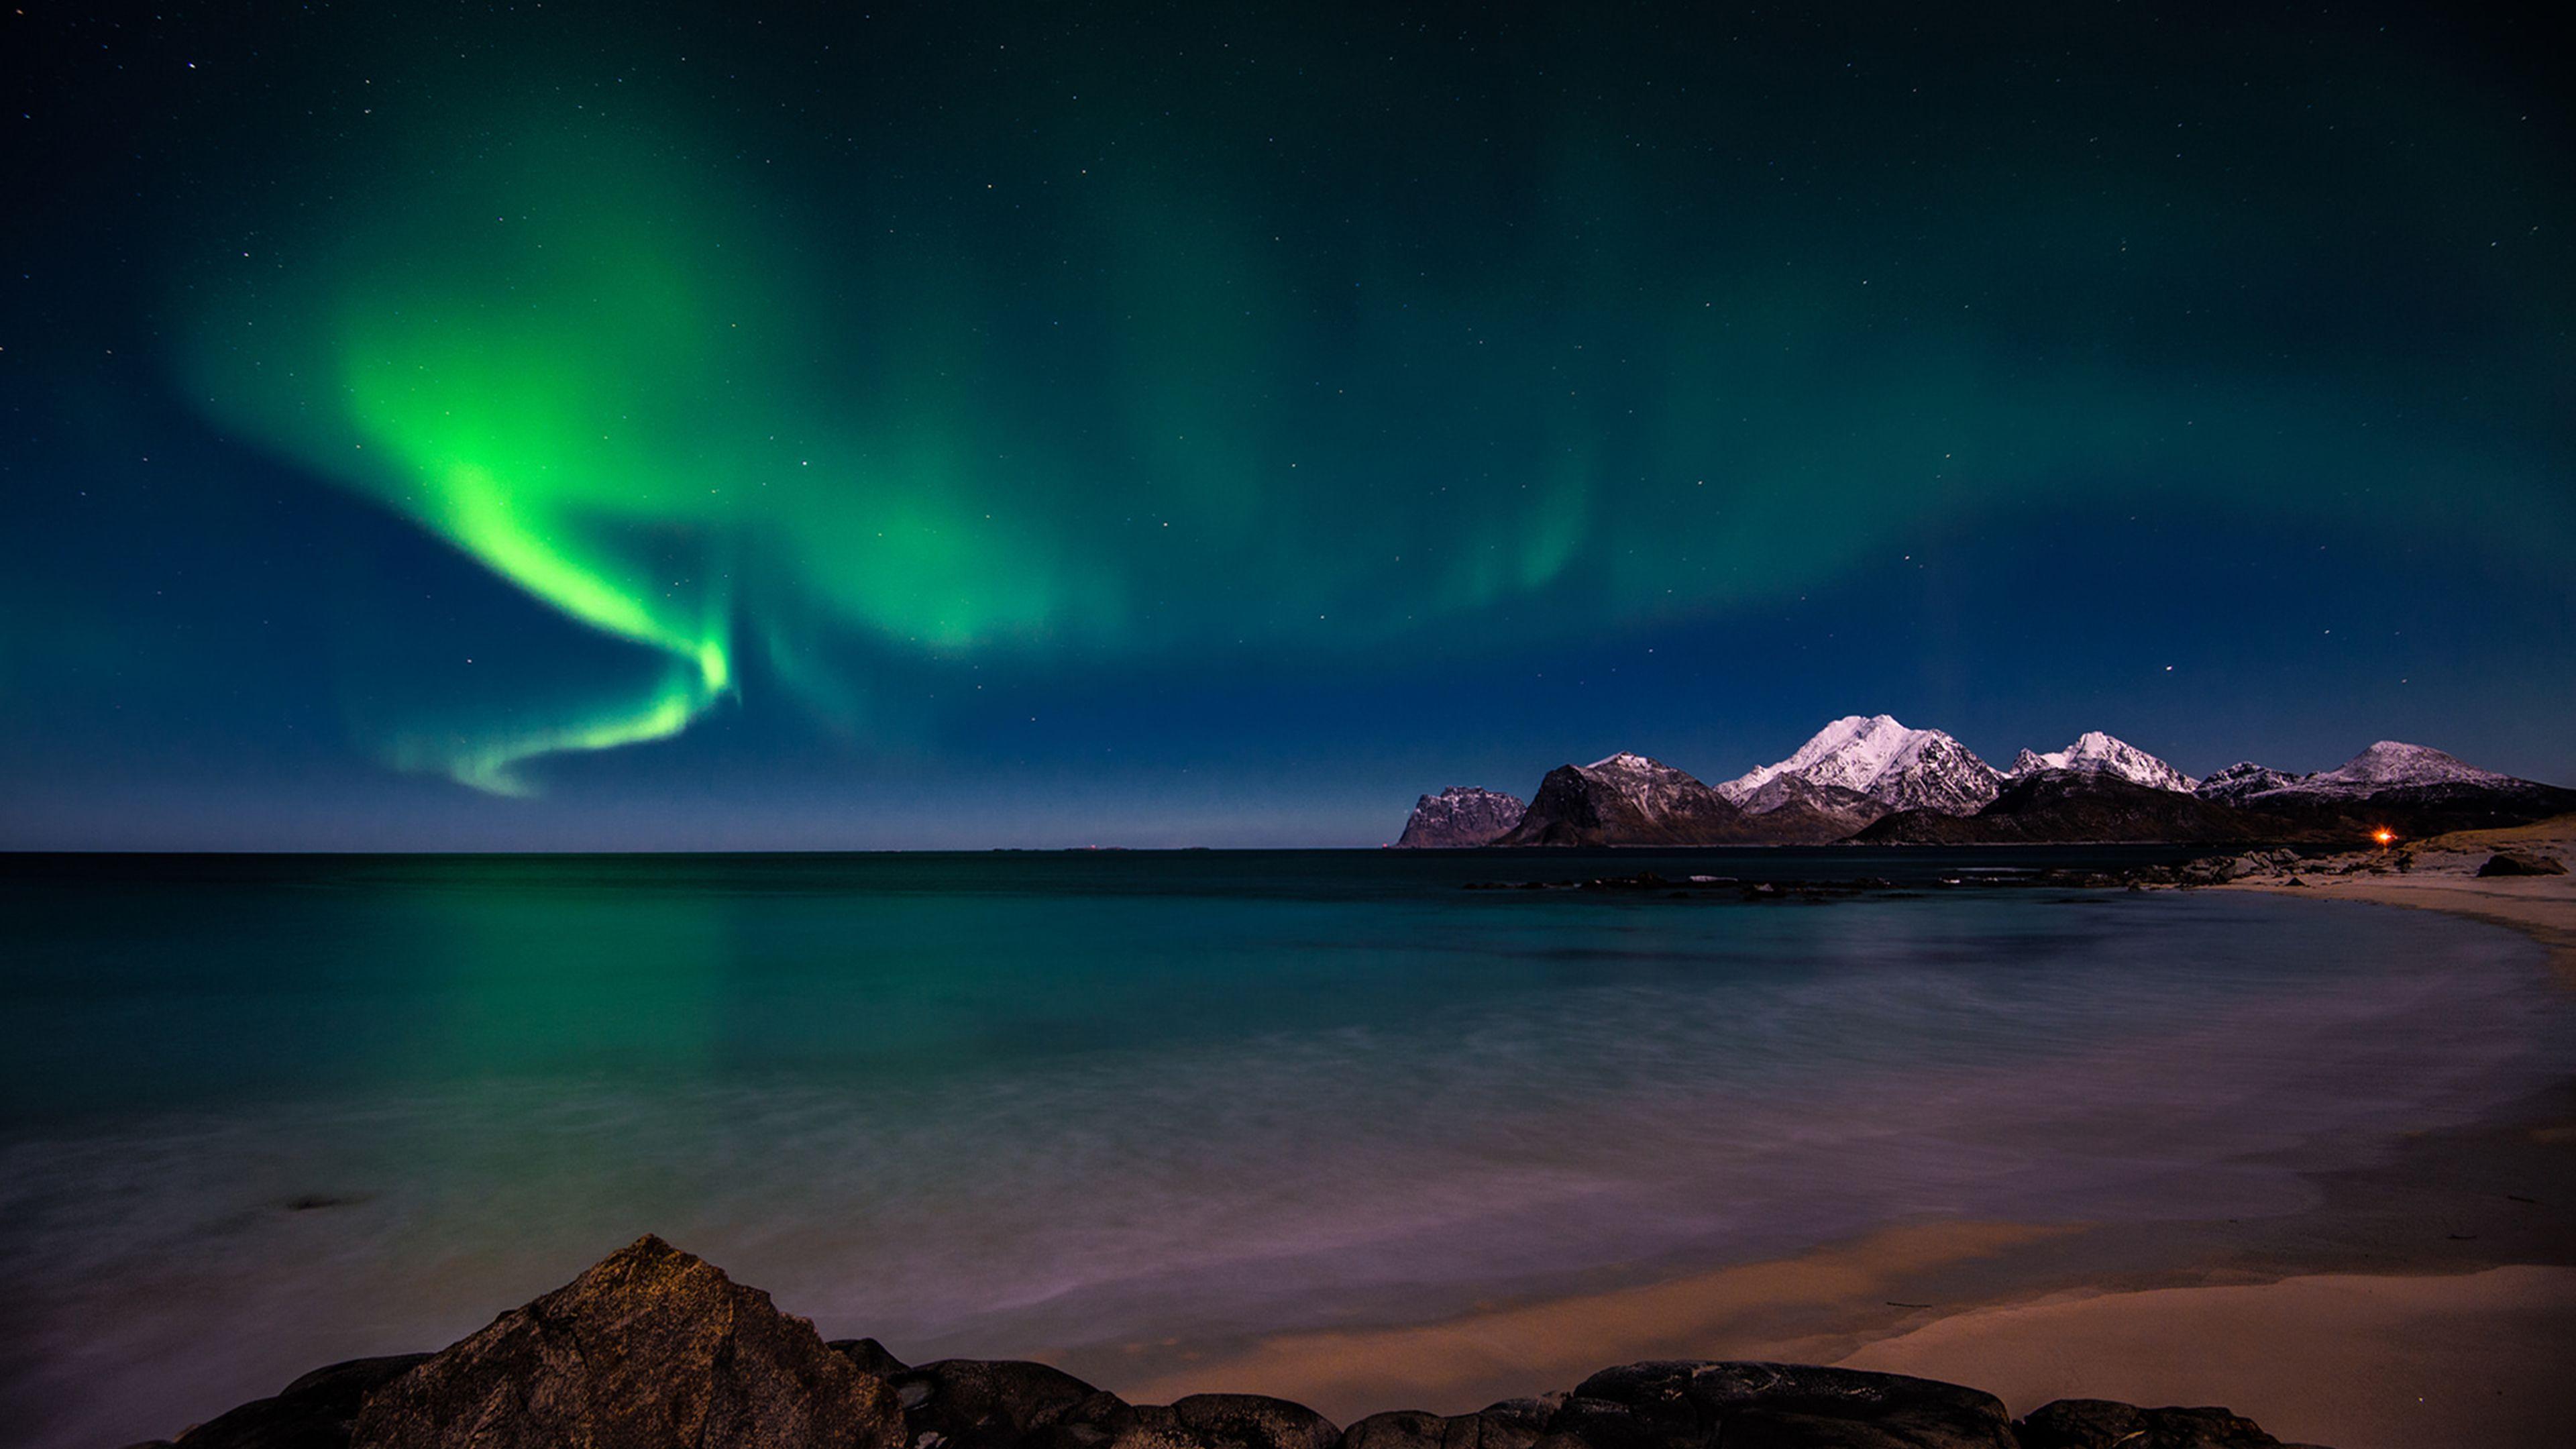 Aurora 4k Wallpapers Top Free Aurora 4k Backgrounds Wallpaperaccess